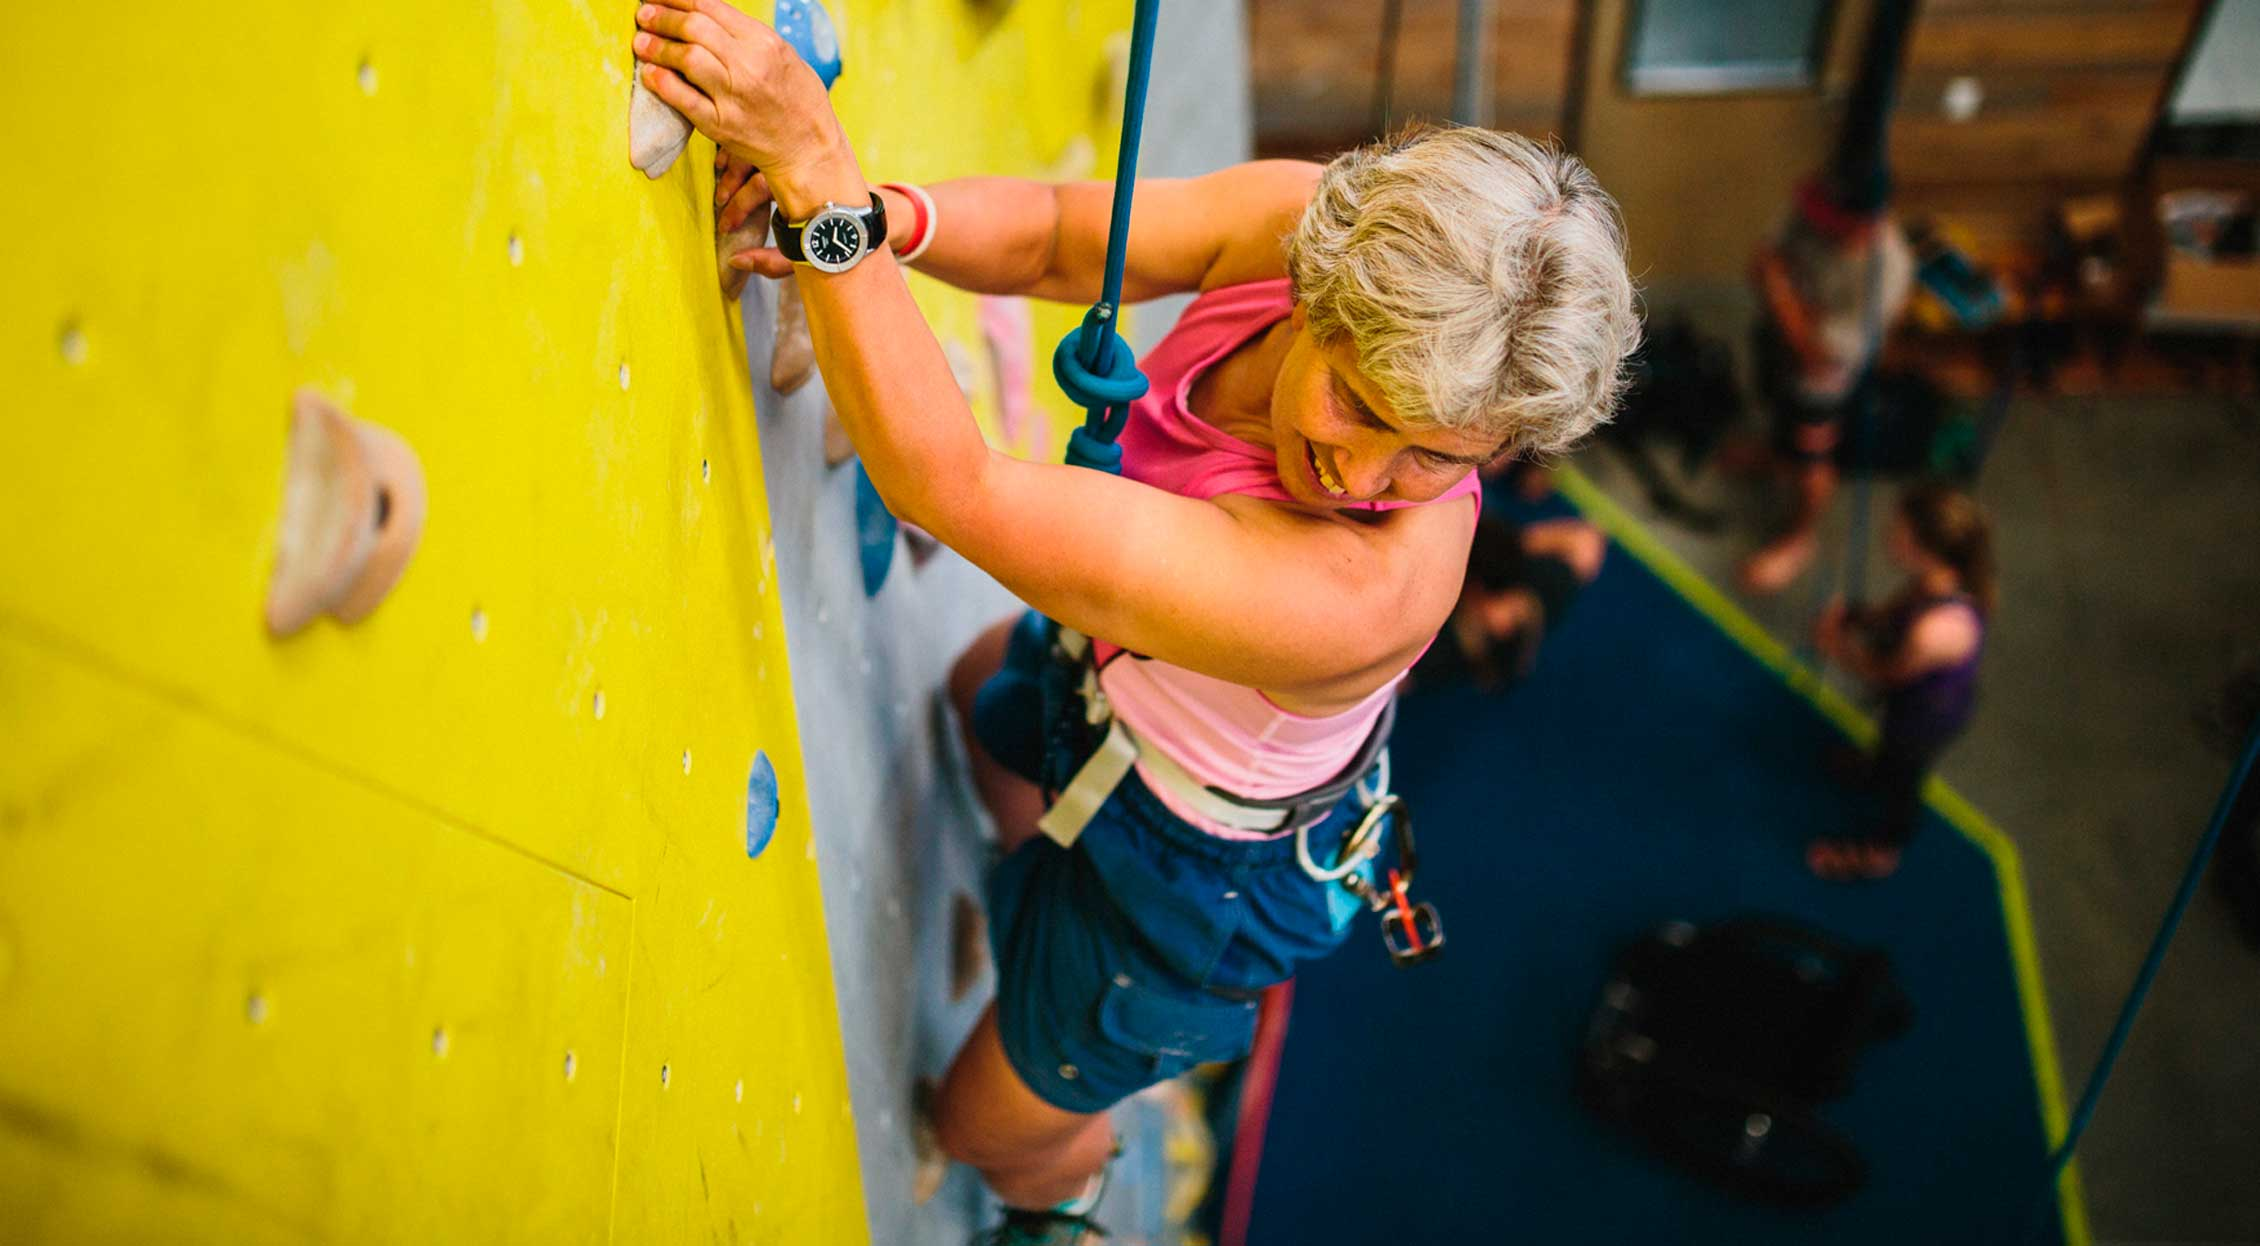 adaptive athlete rock climbing bend rock gym